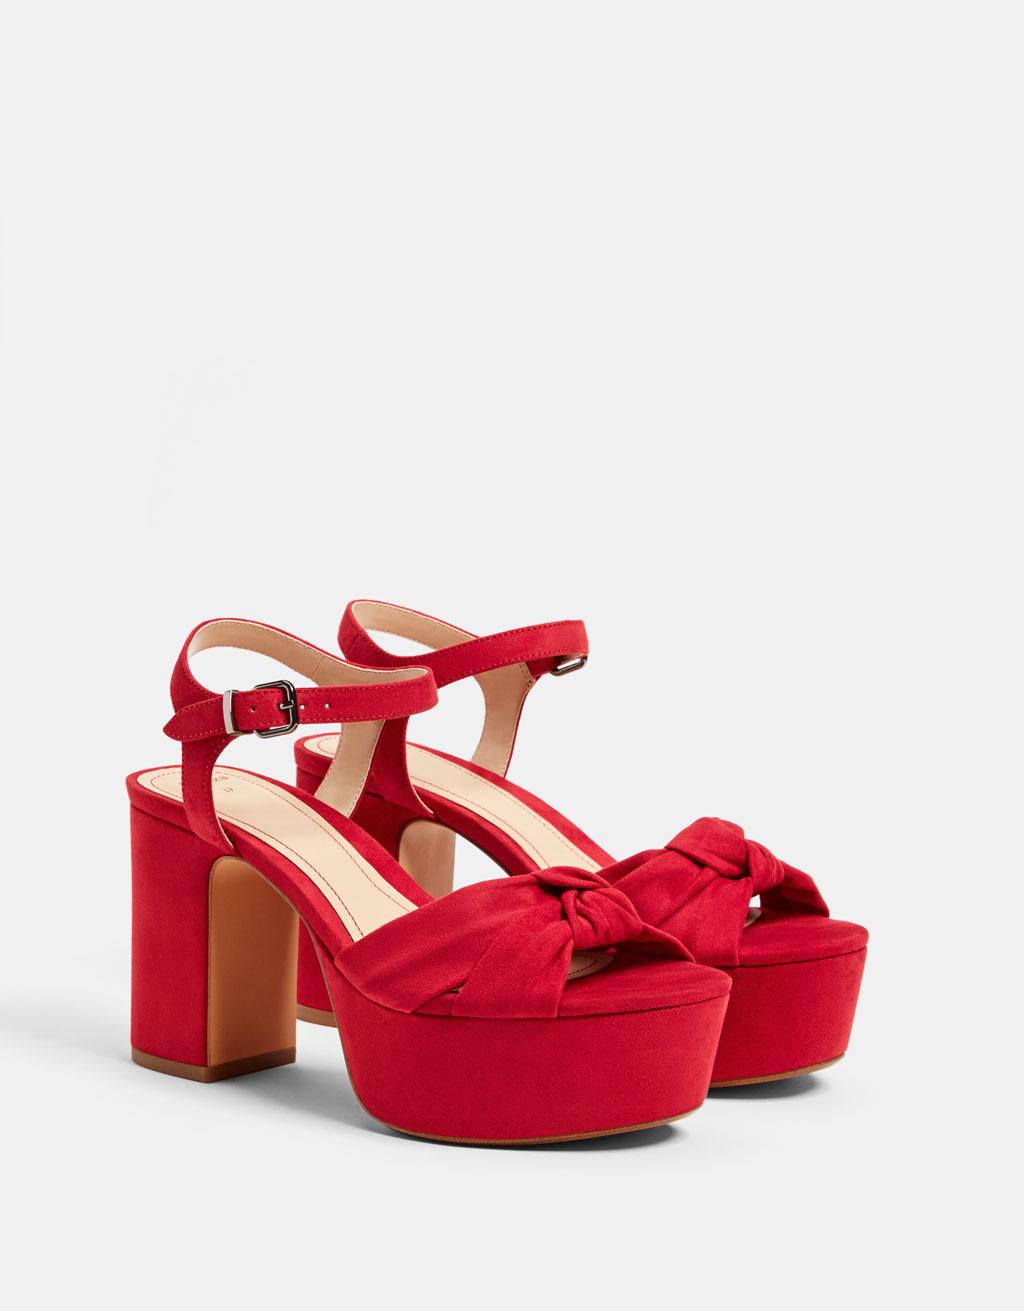 High heel platform sandals